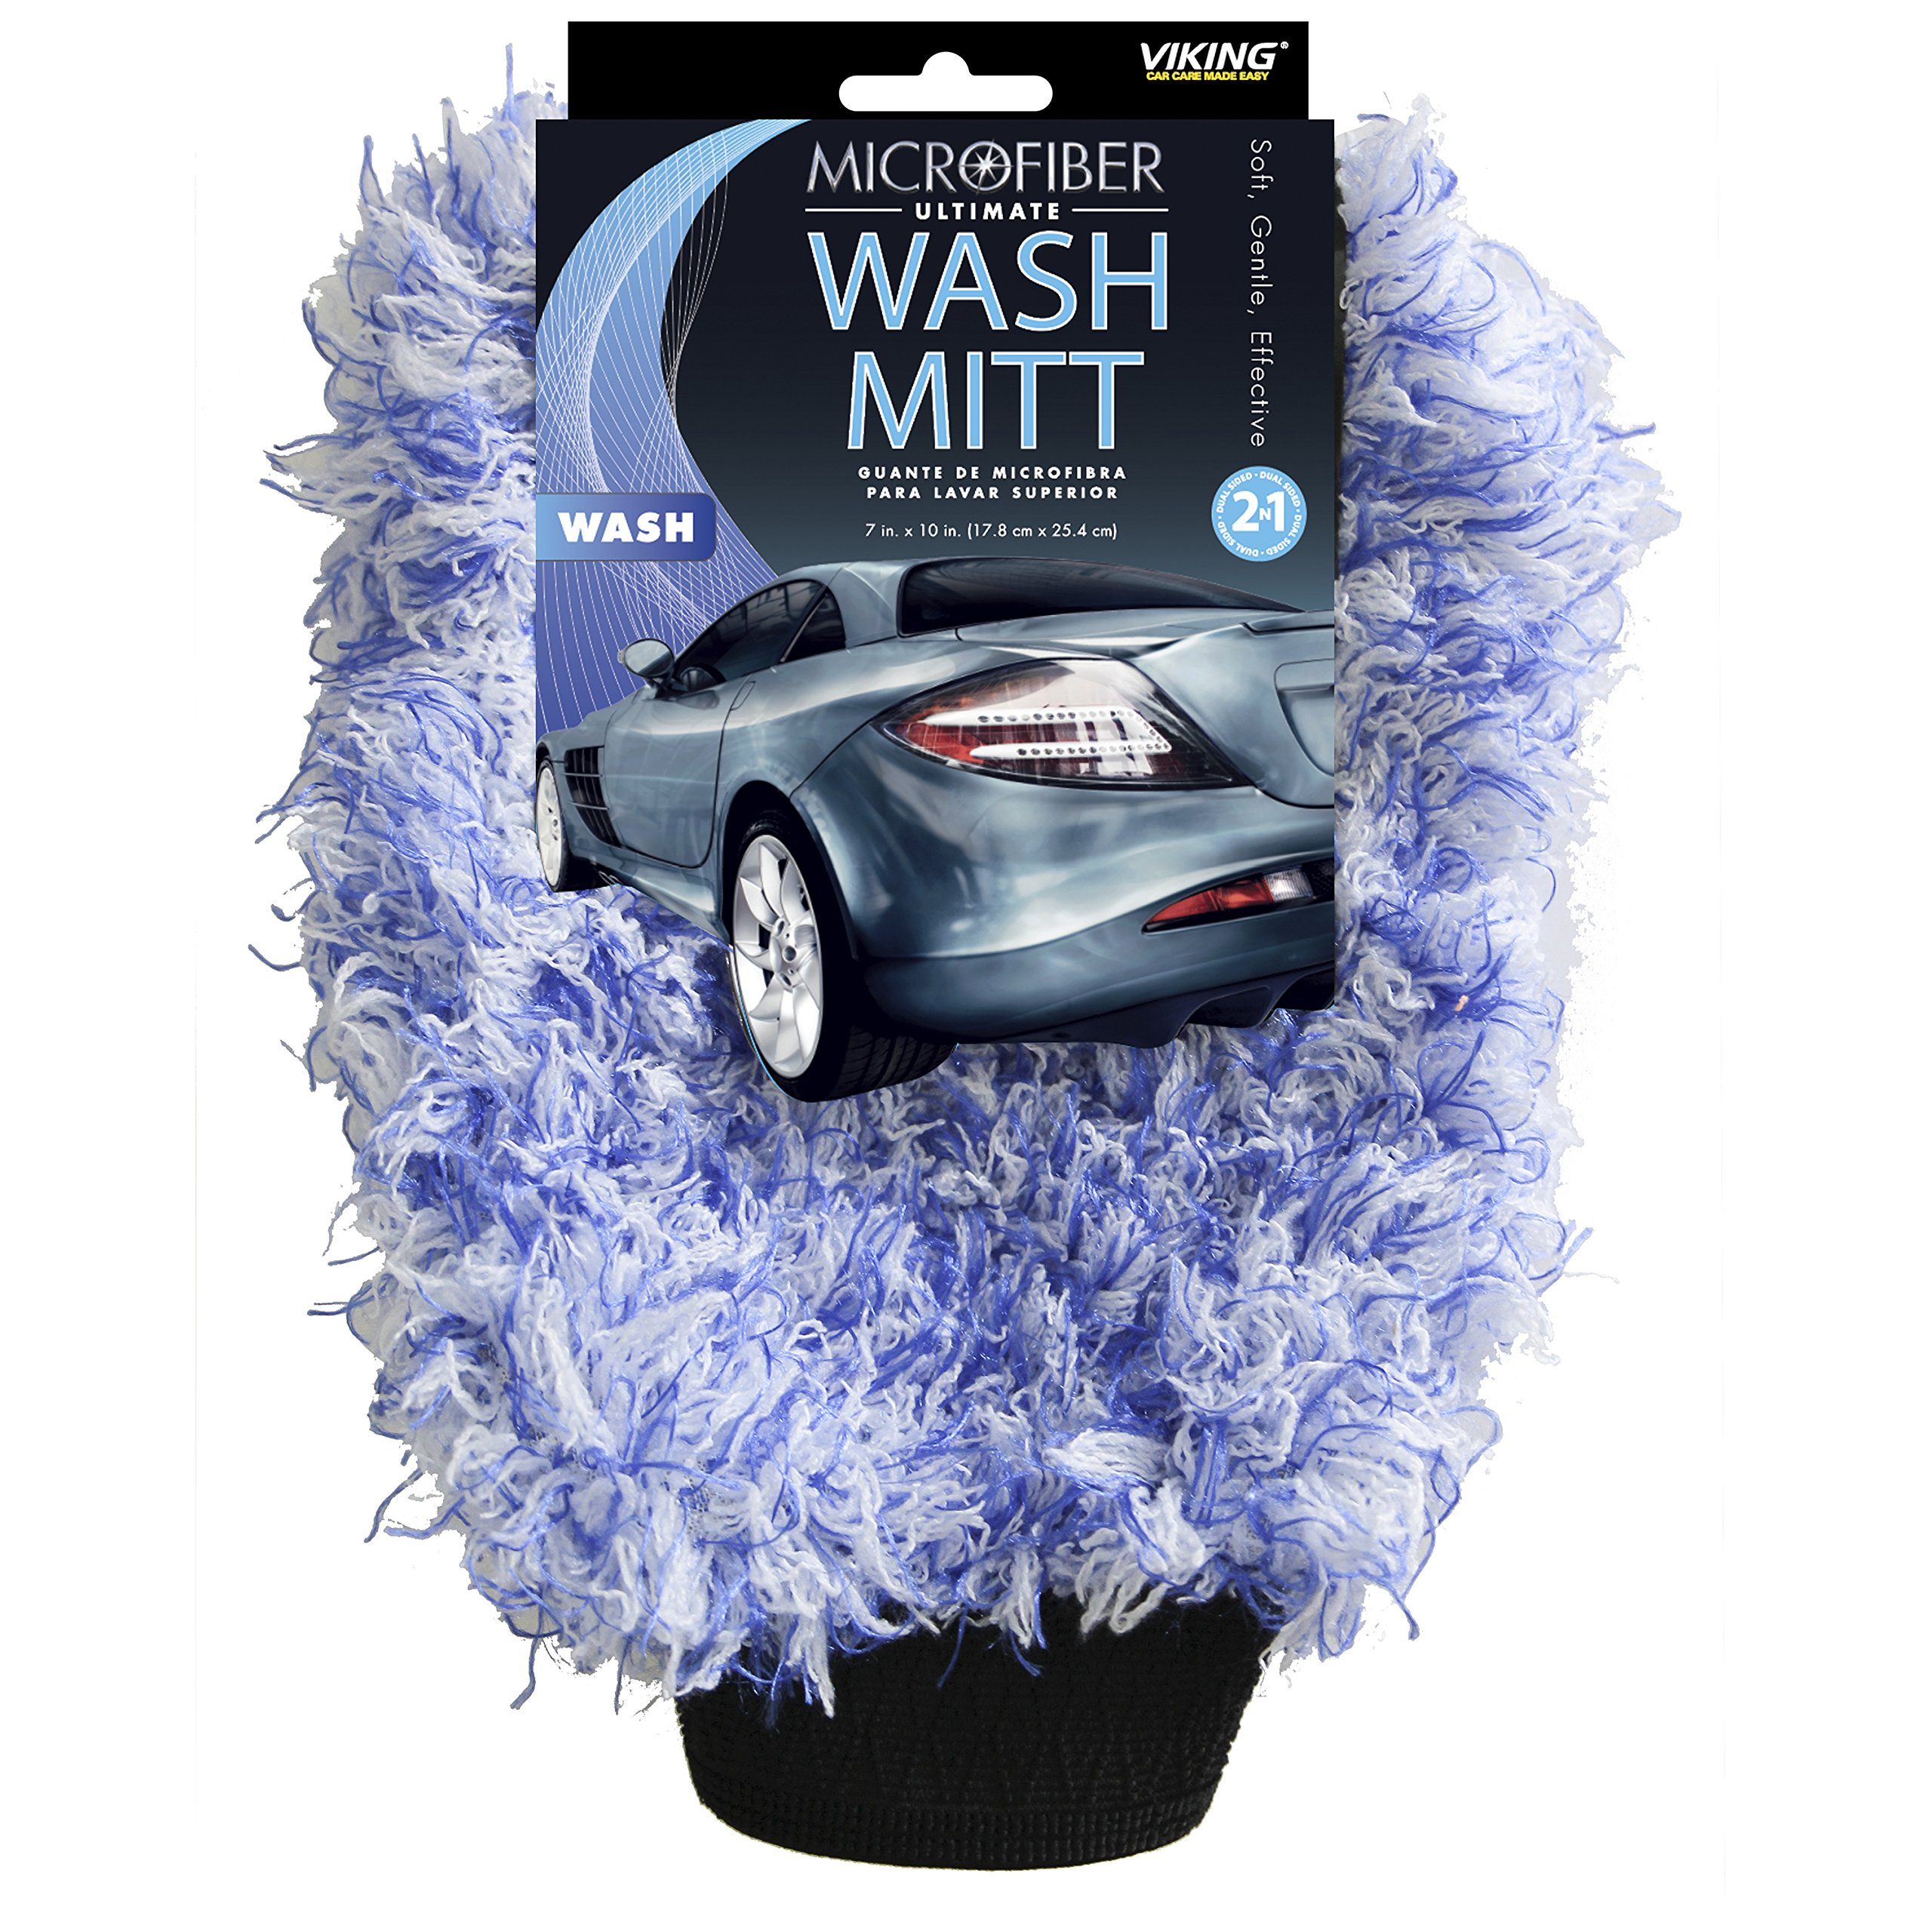 Viking Microfiber Car Wash Mitt - Scratch-free